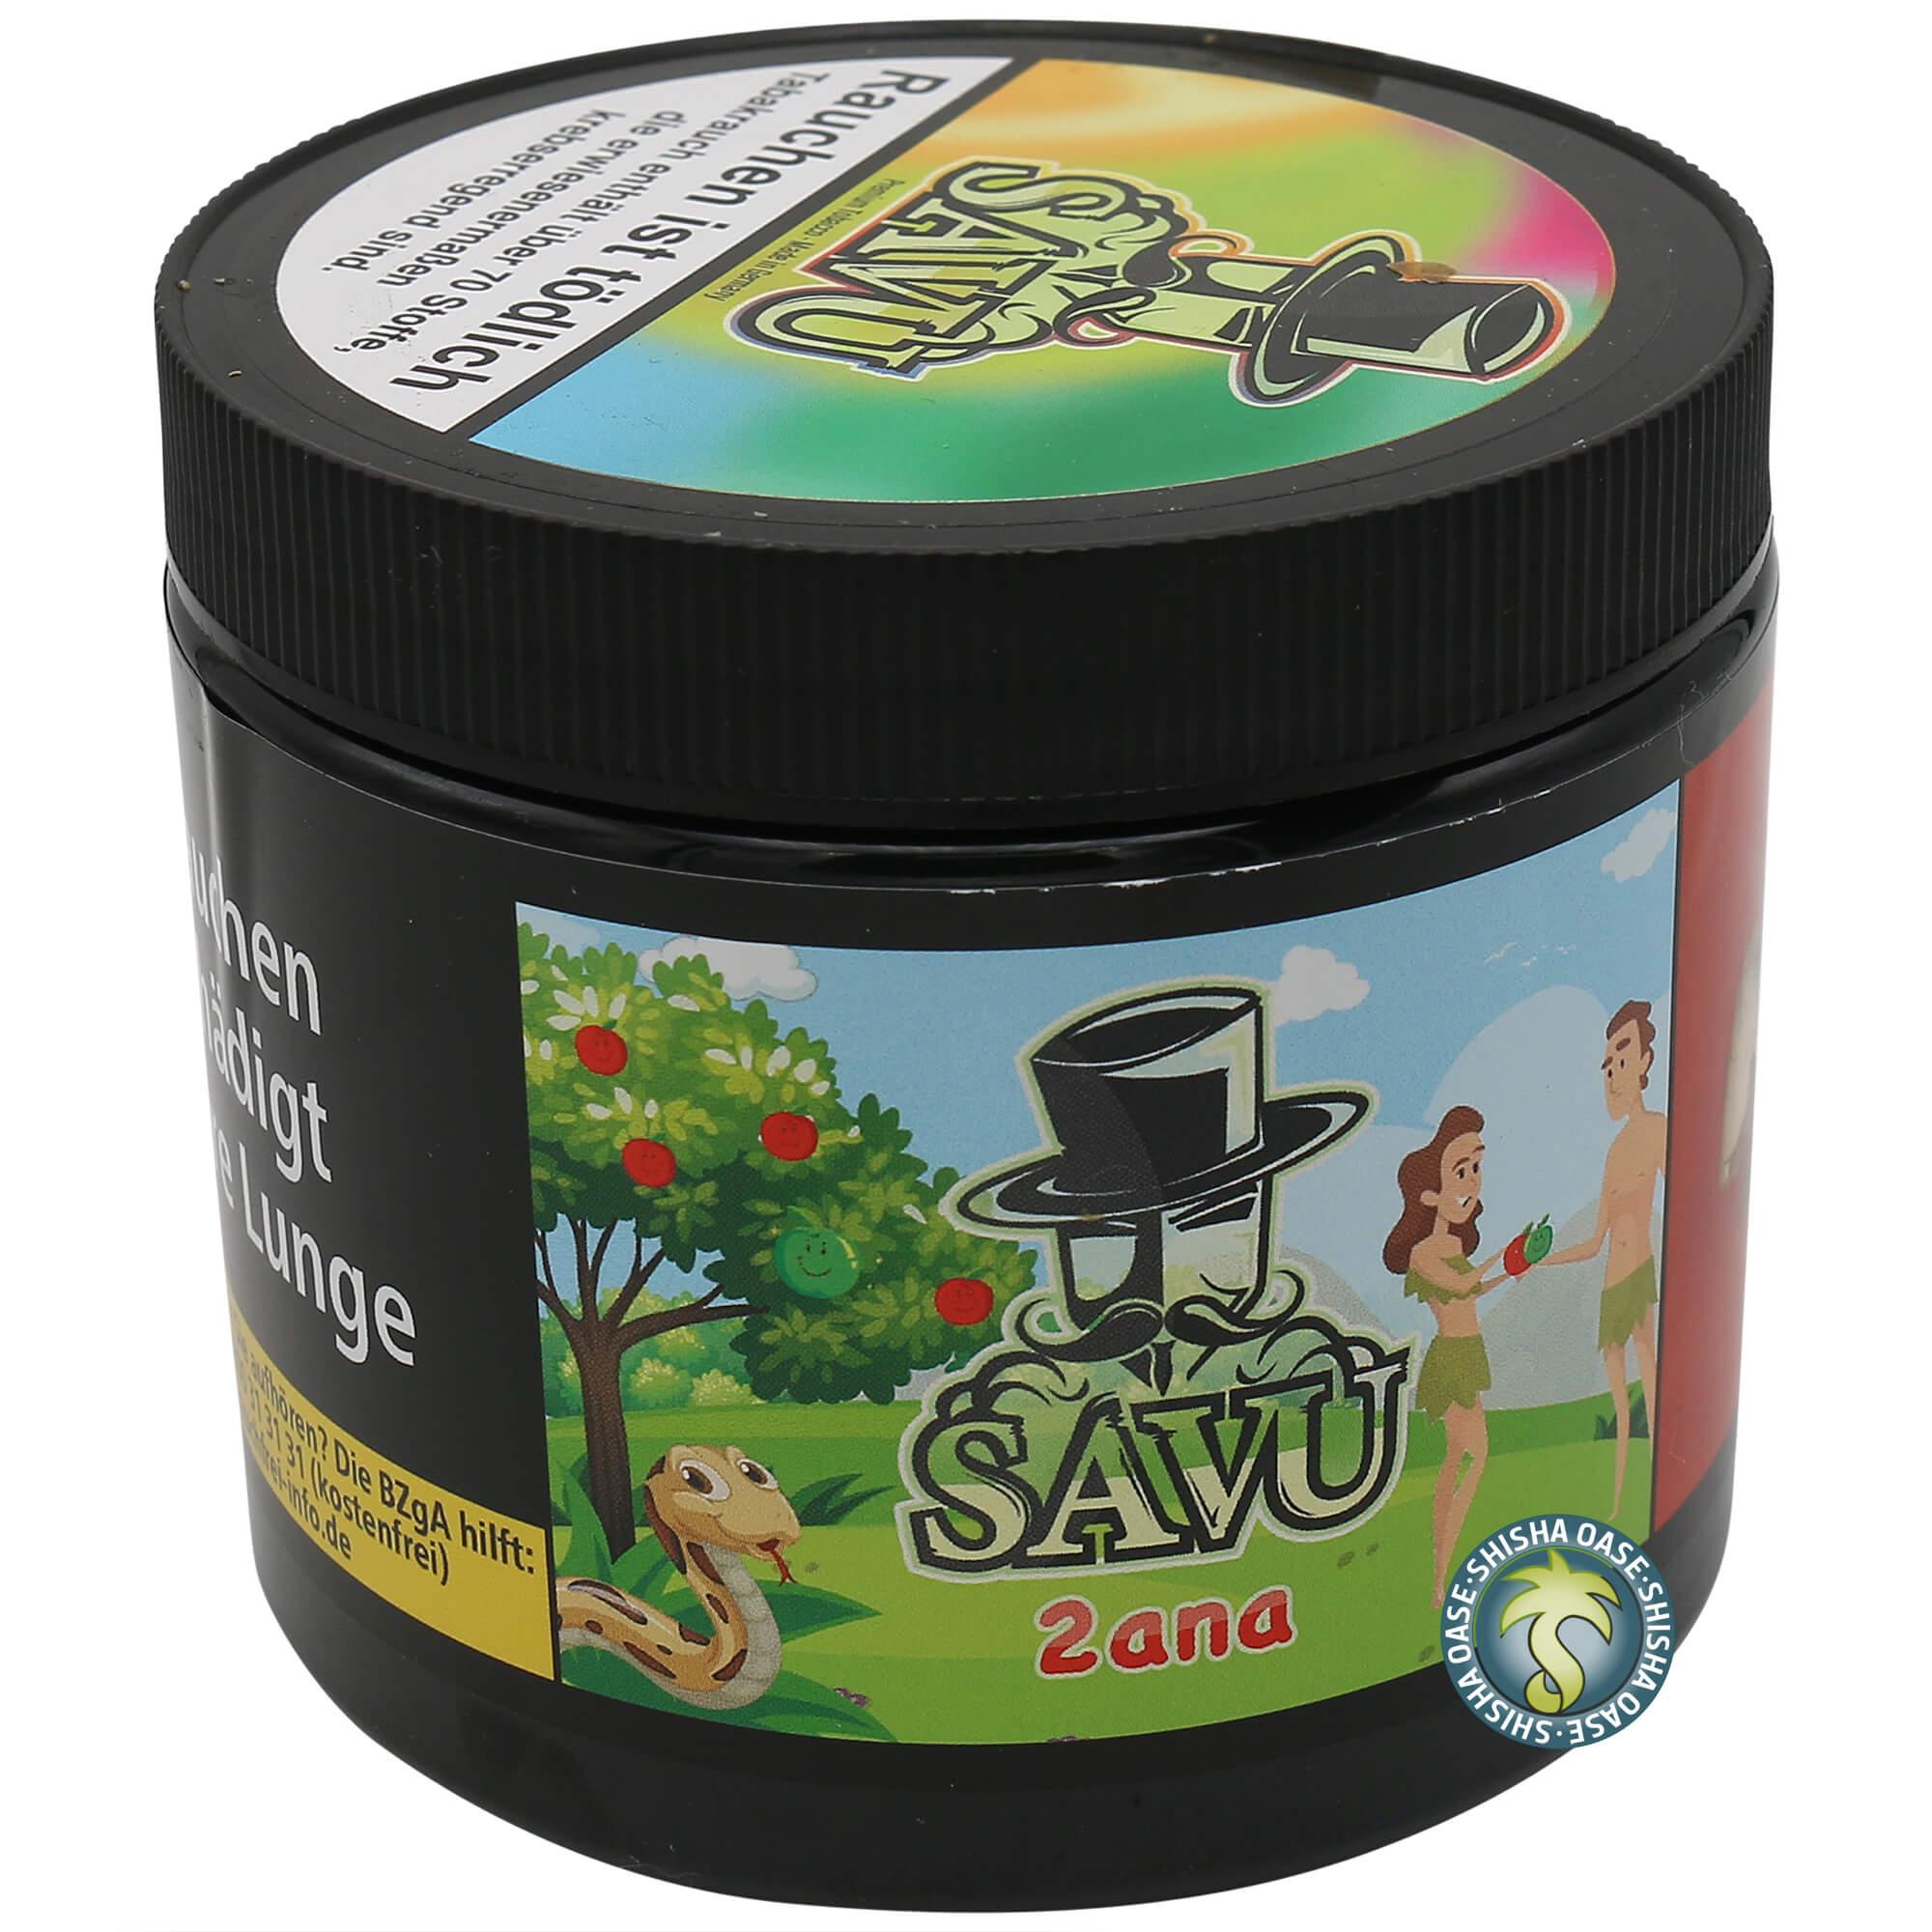 Savu Tobacco 2ana 200g